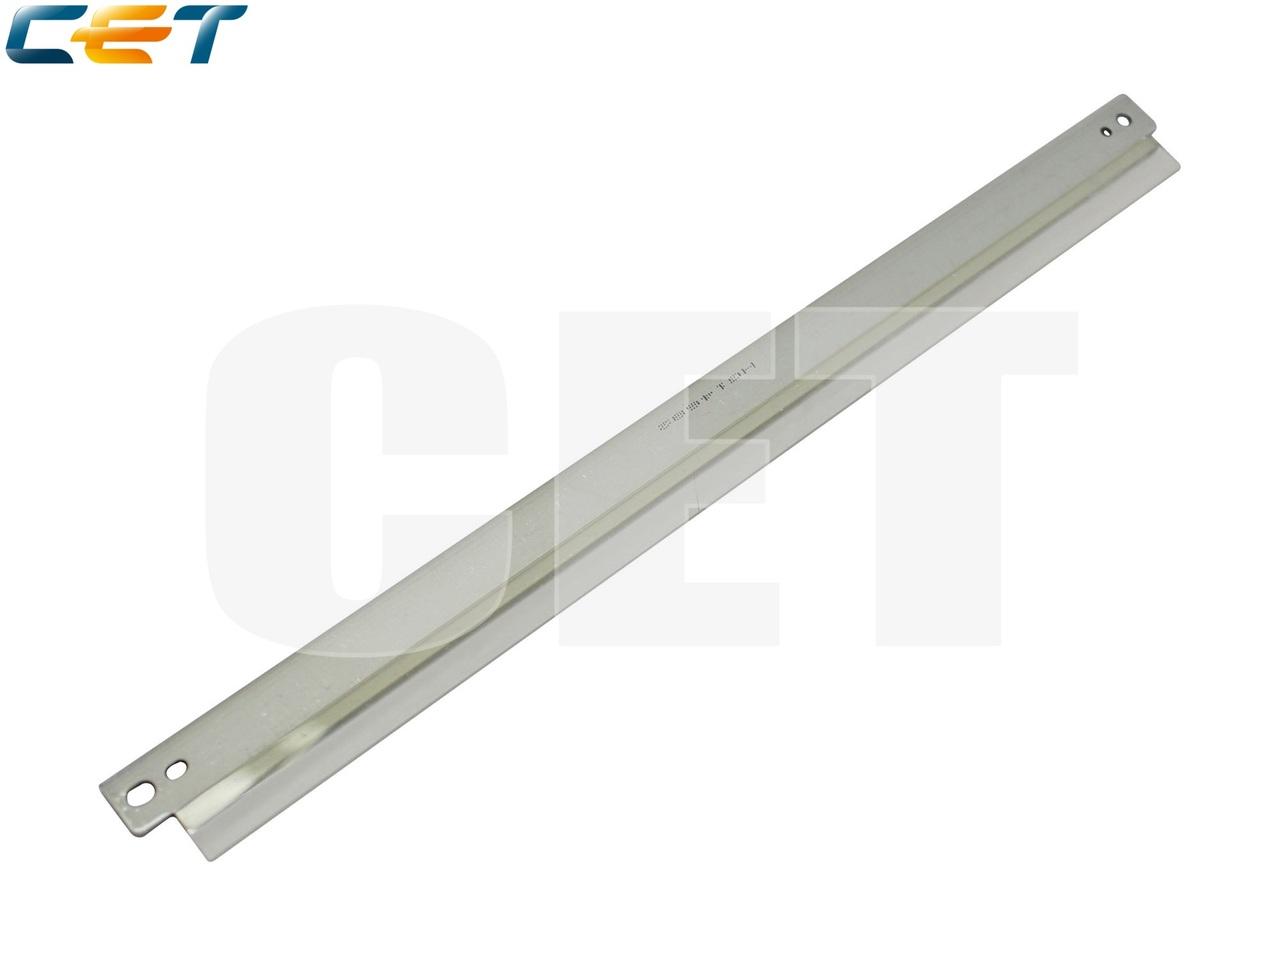 Ракель 6LA27845000 для TOSHIBA E-Studio 163/182/212/242(CET), CET4682